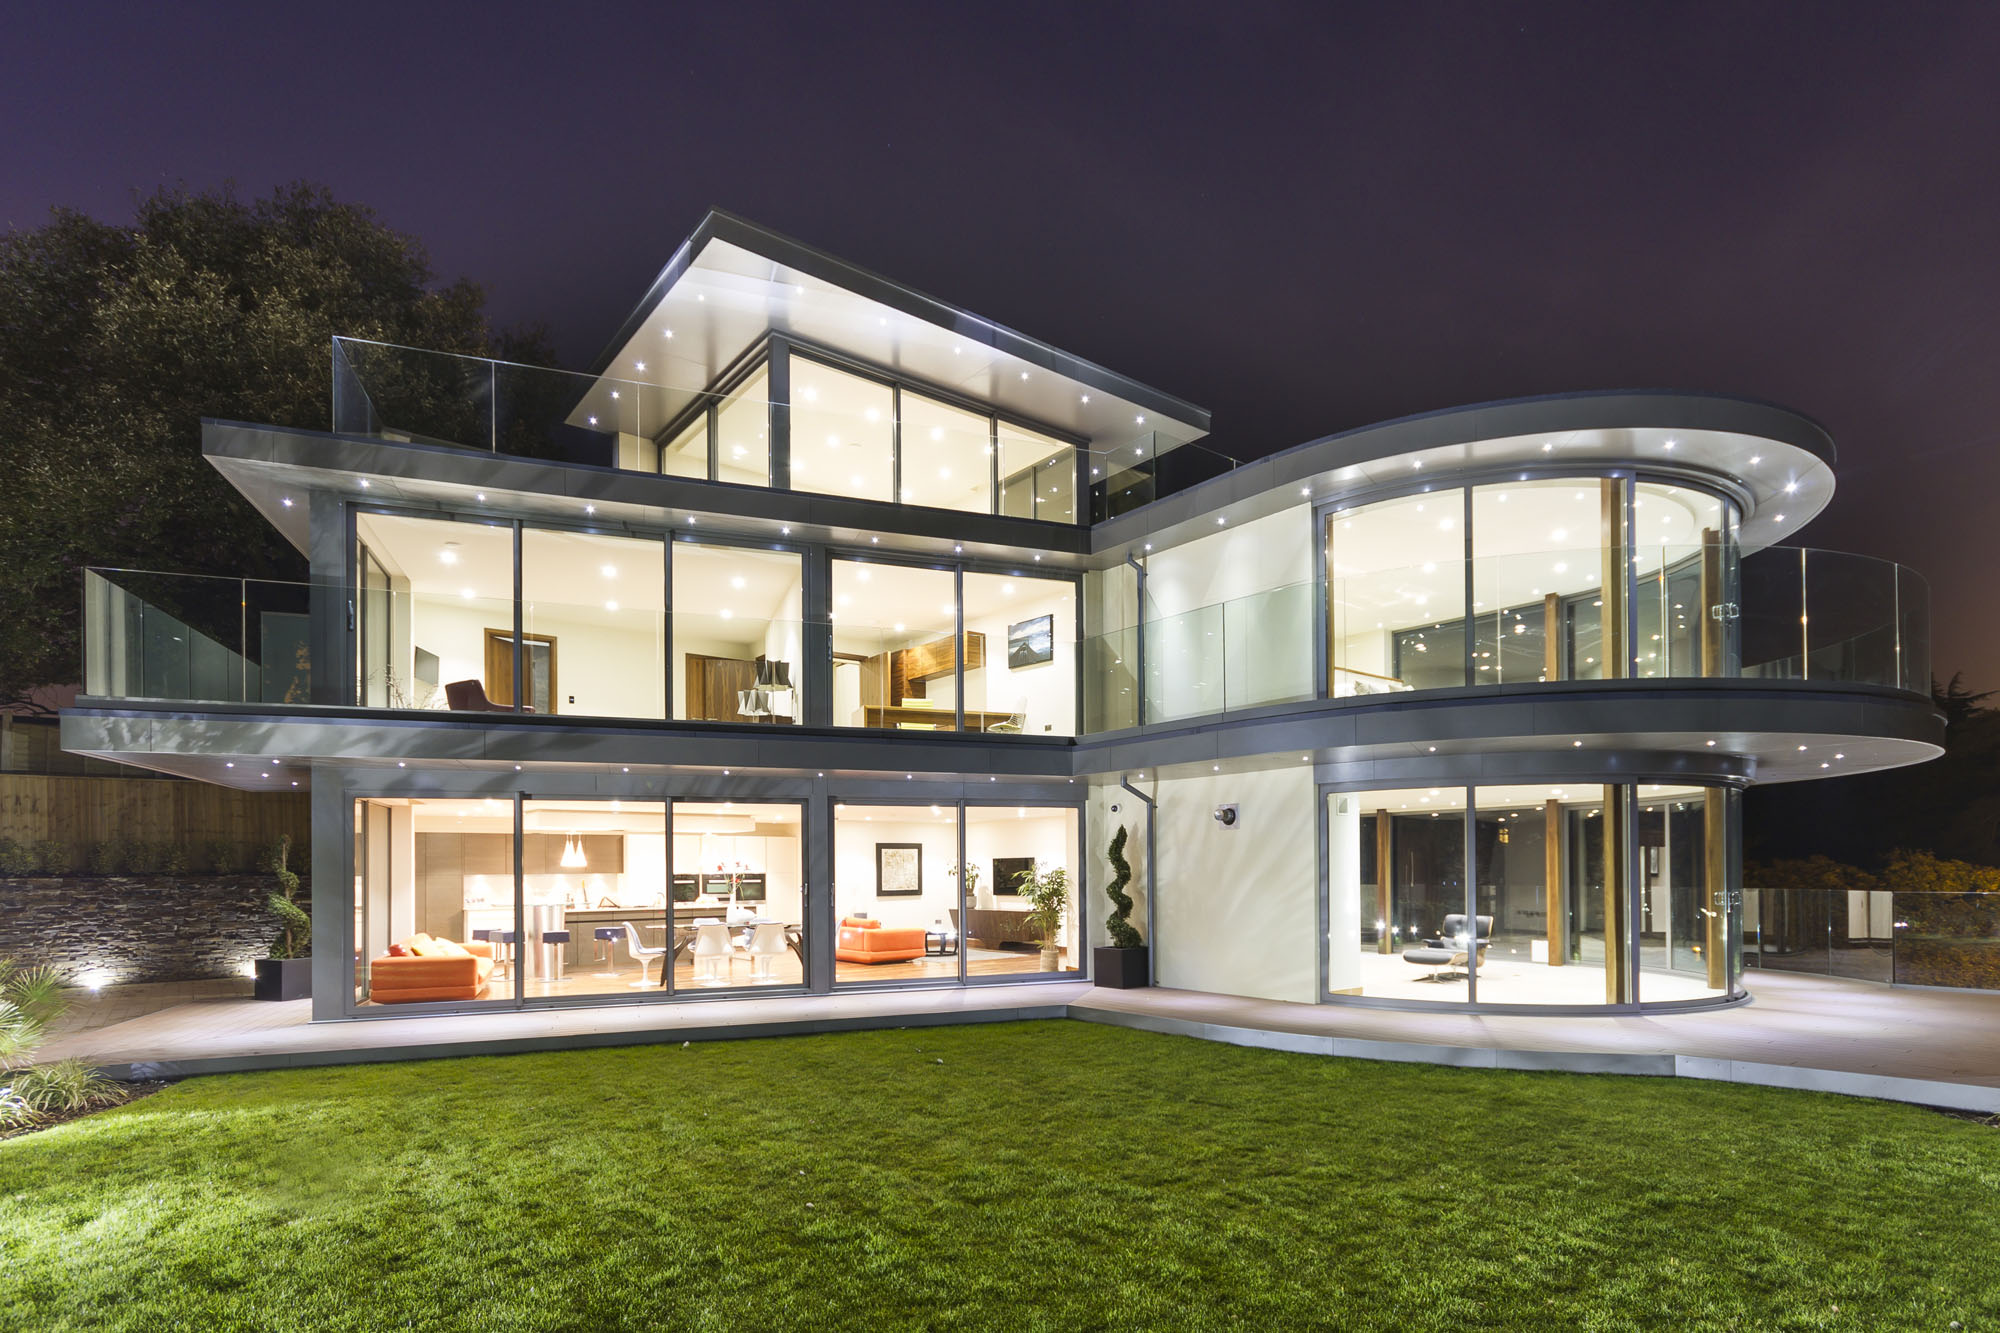 Ventura by david james architects associates - Dibujos de casas modernas ...